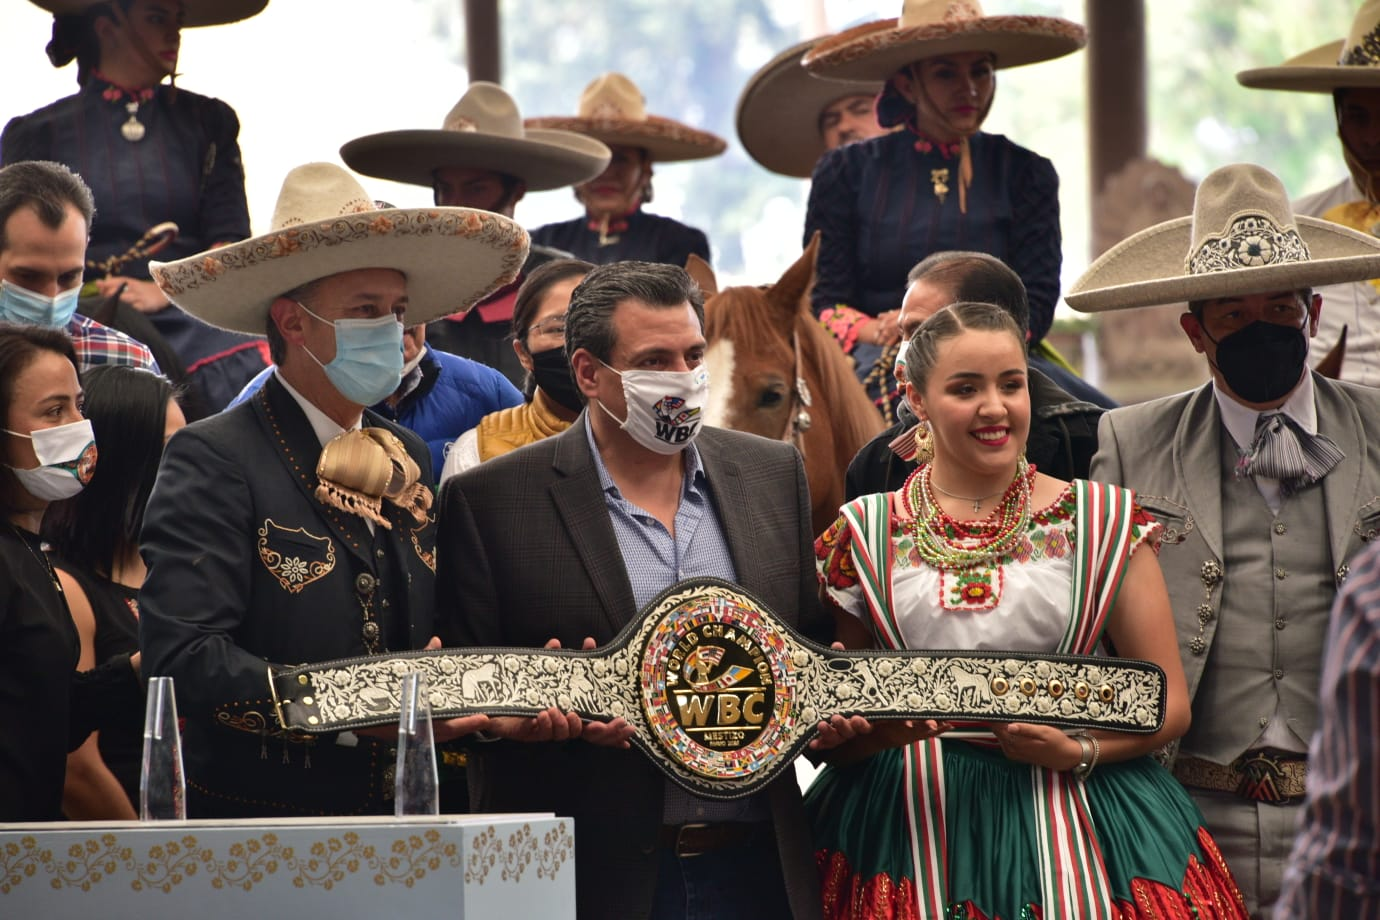 Spectacular & Unforgettable Presentation of the Magnificent Mestizo Belt | Boxen247.com